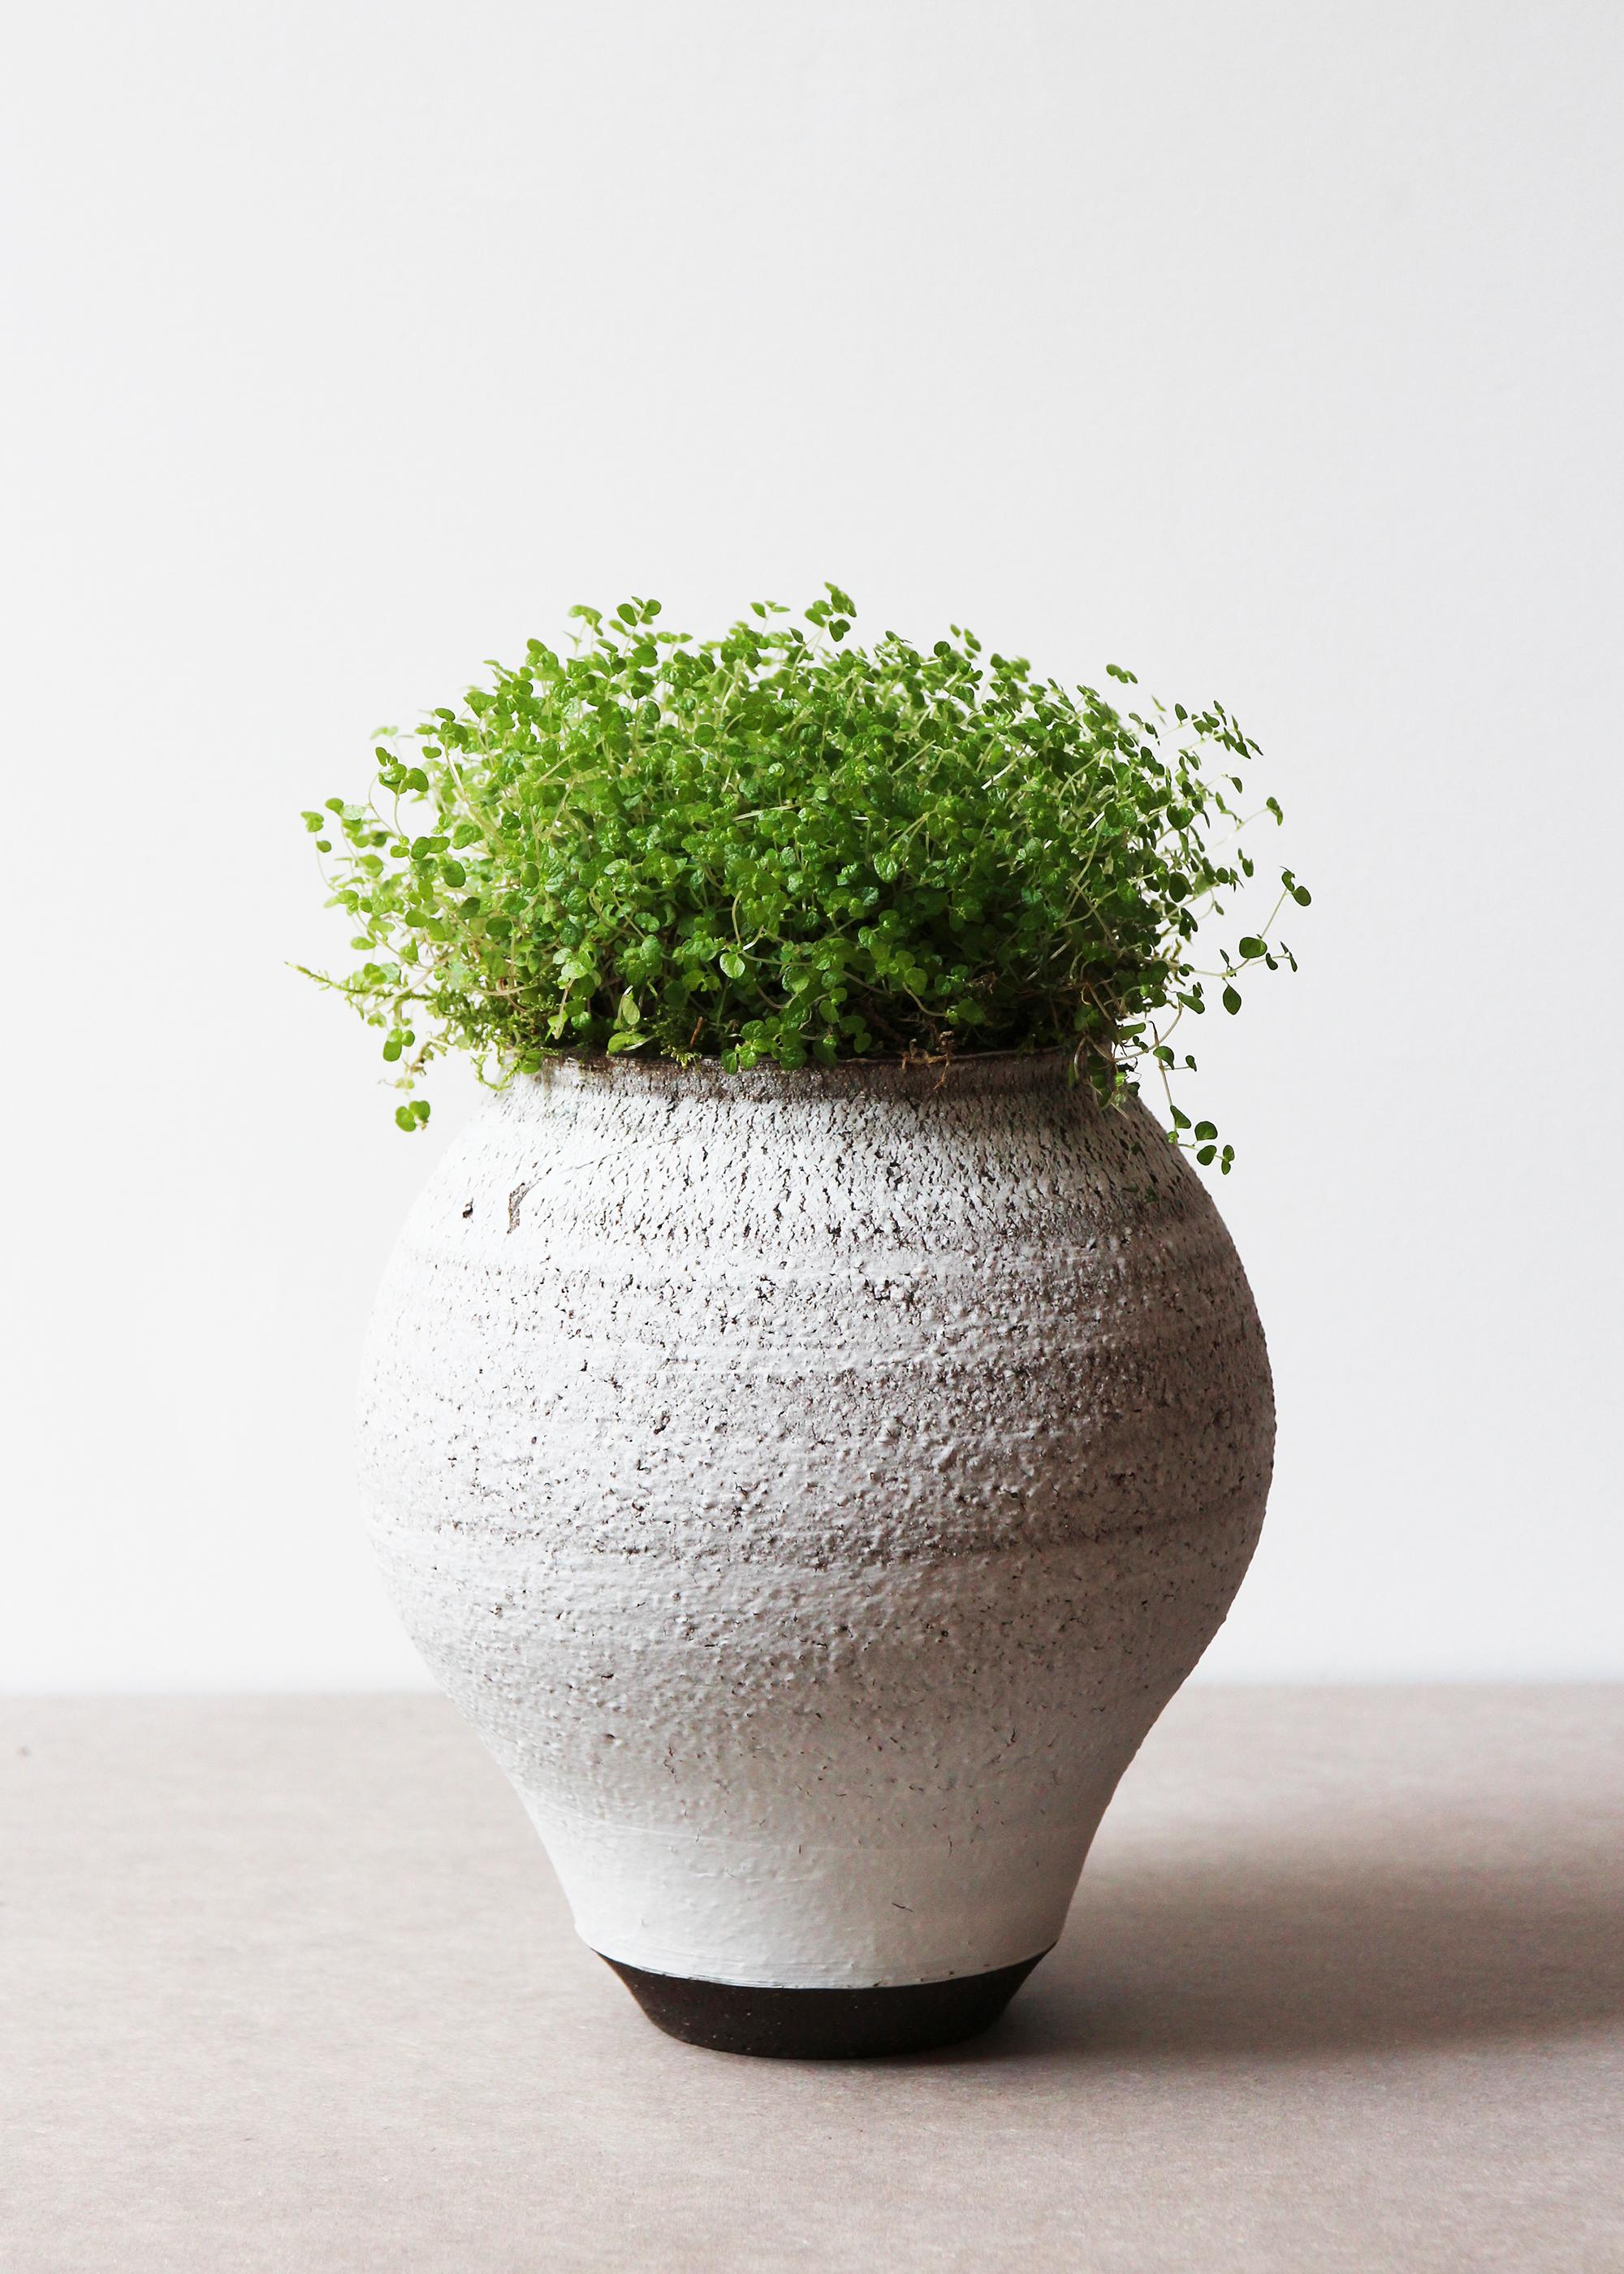 Vase  英国 UK, 2017